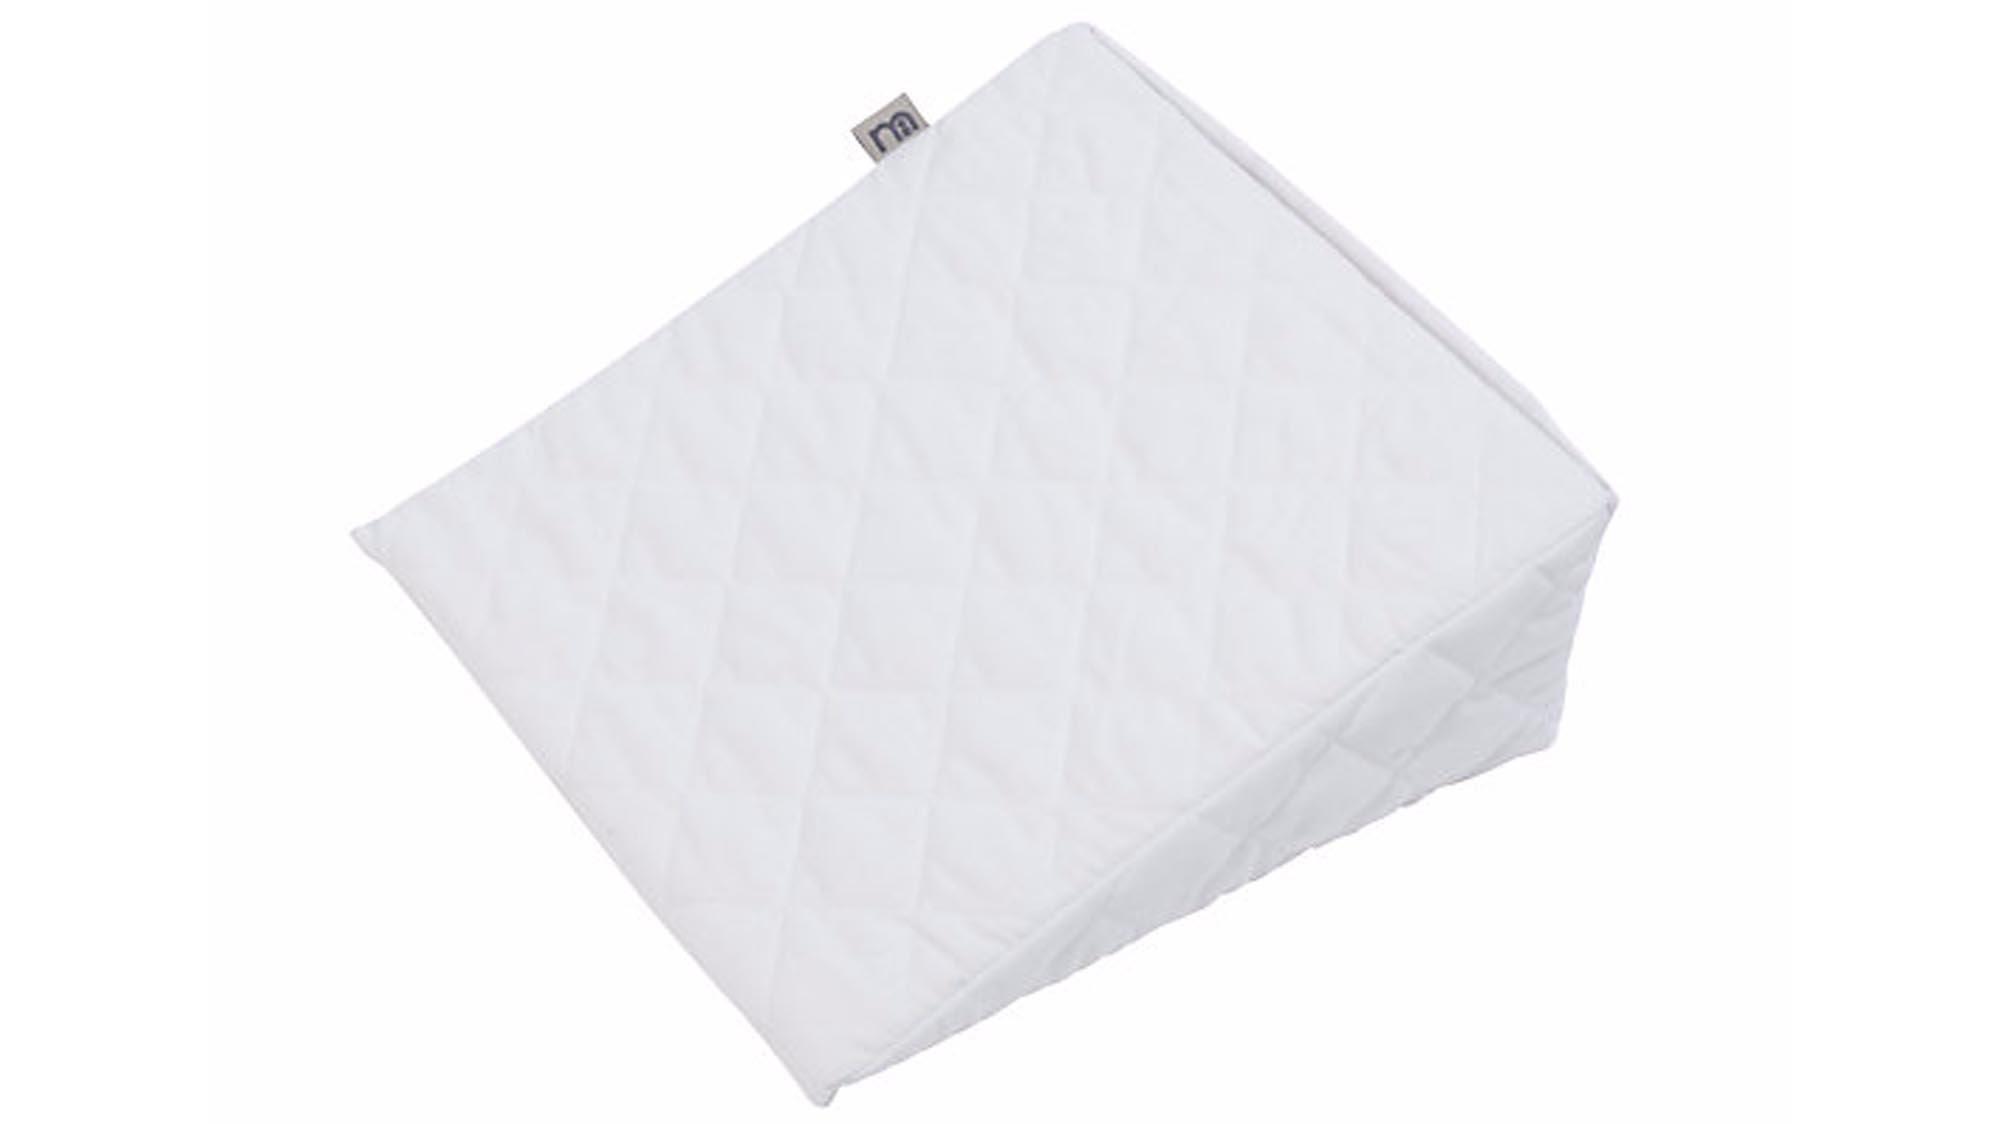 Chicco Boppy Pillow Total Body Silverleaf